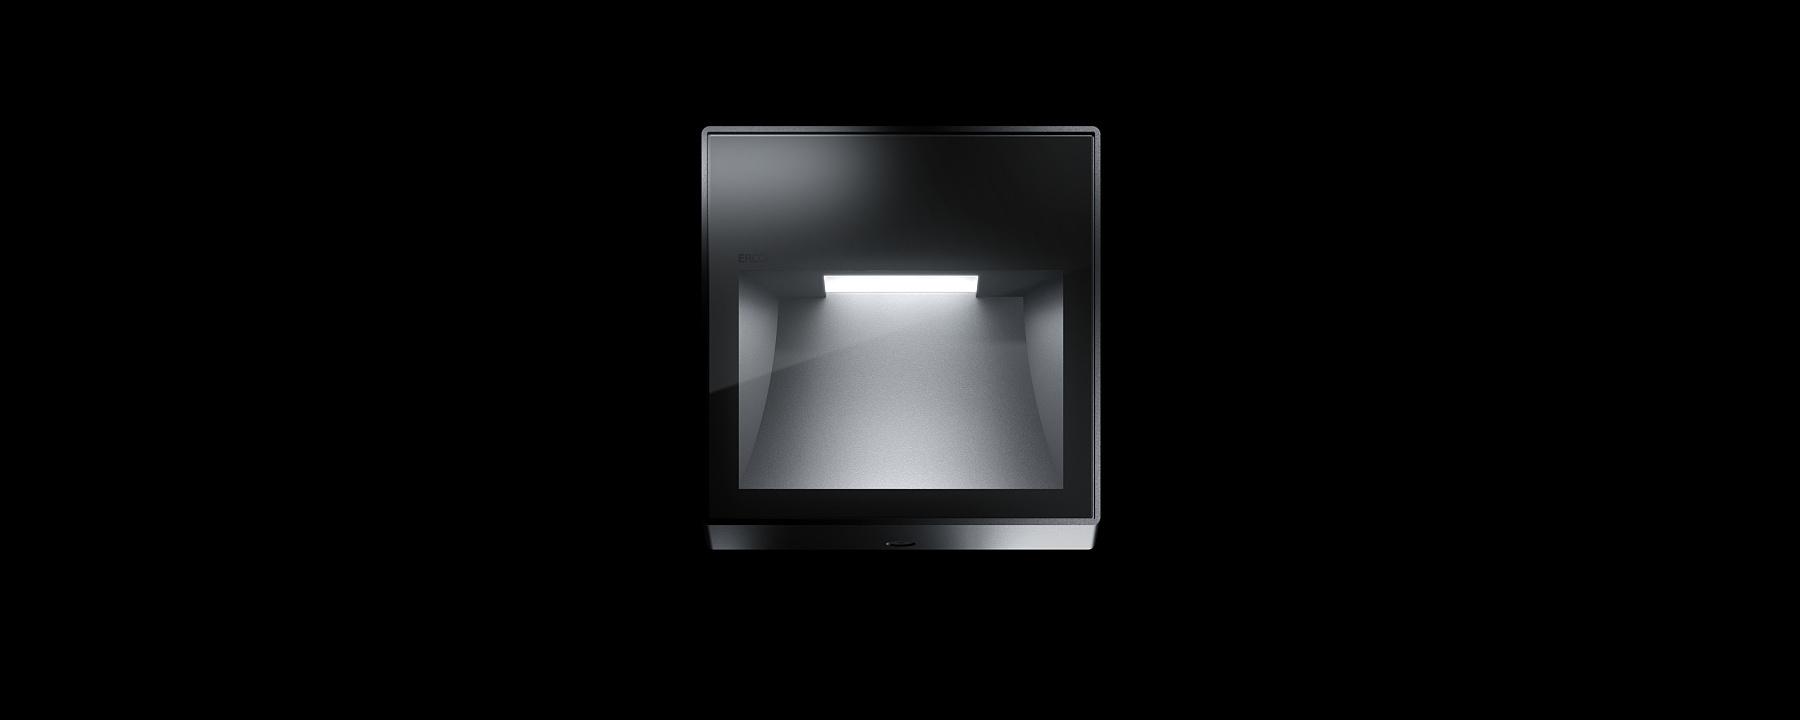 ext rieur appareils d 39 clairage de fa ade lightmark. Black Bedroom Furniture Sets. Home Design Ideas